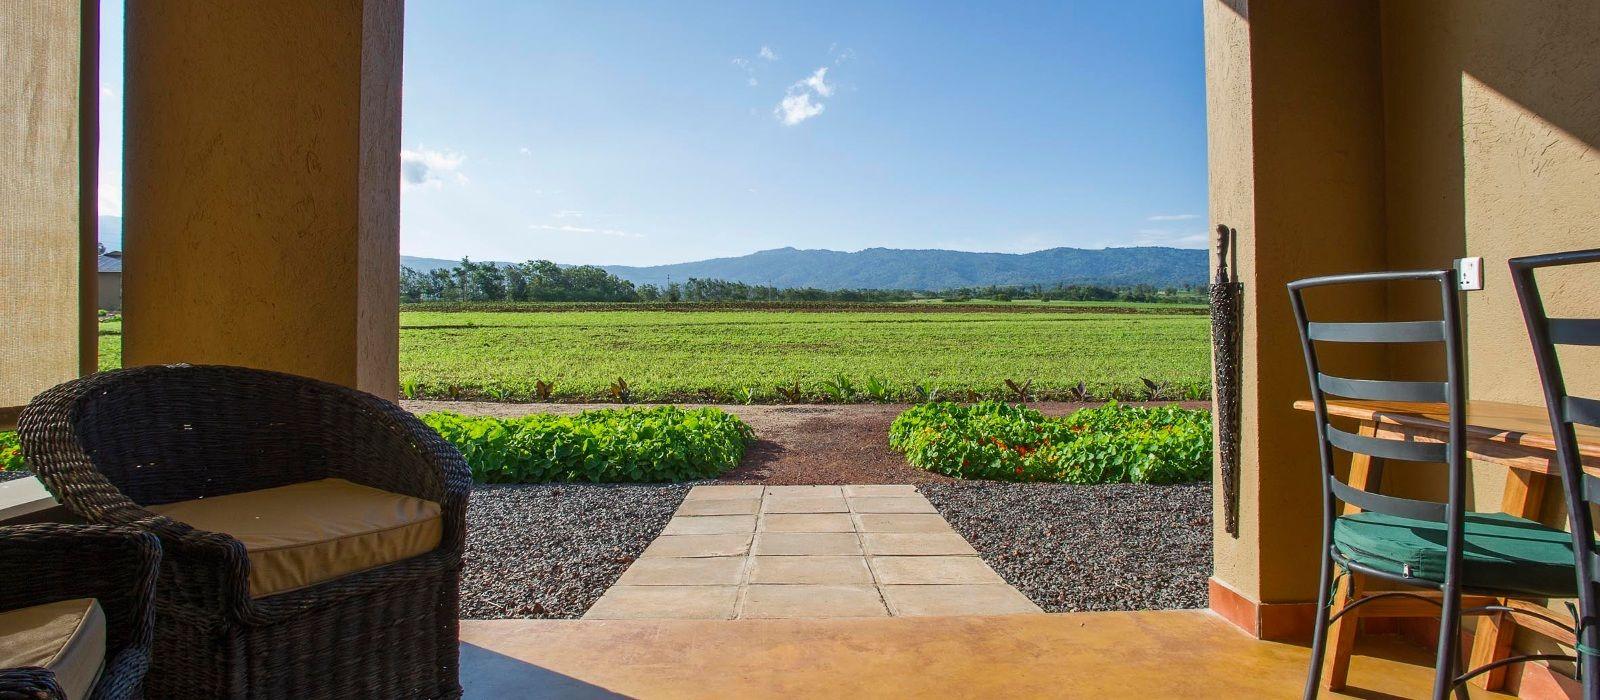 Hotel Farm House Valley